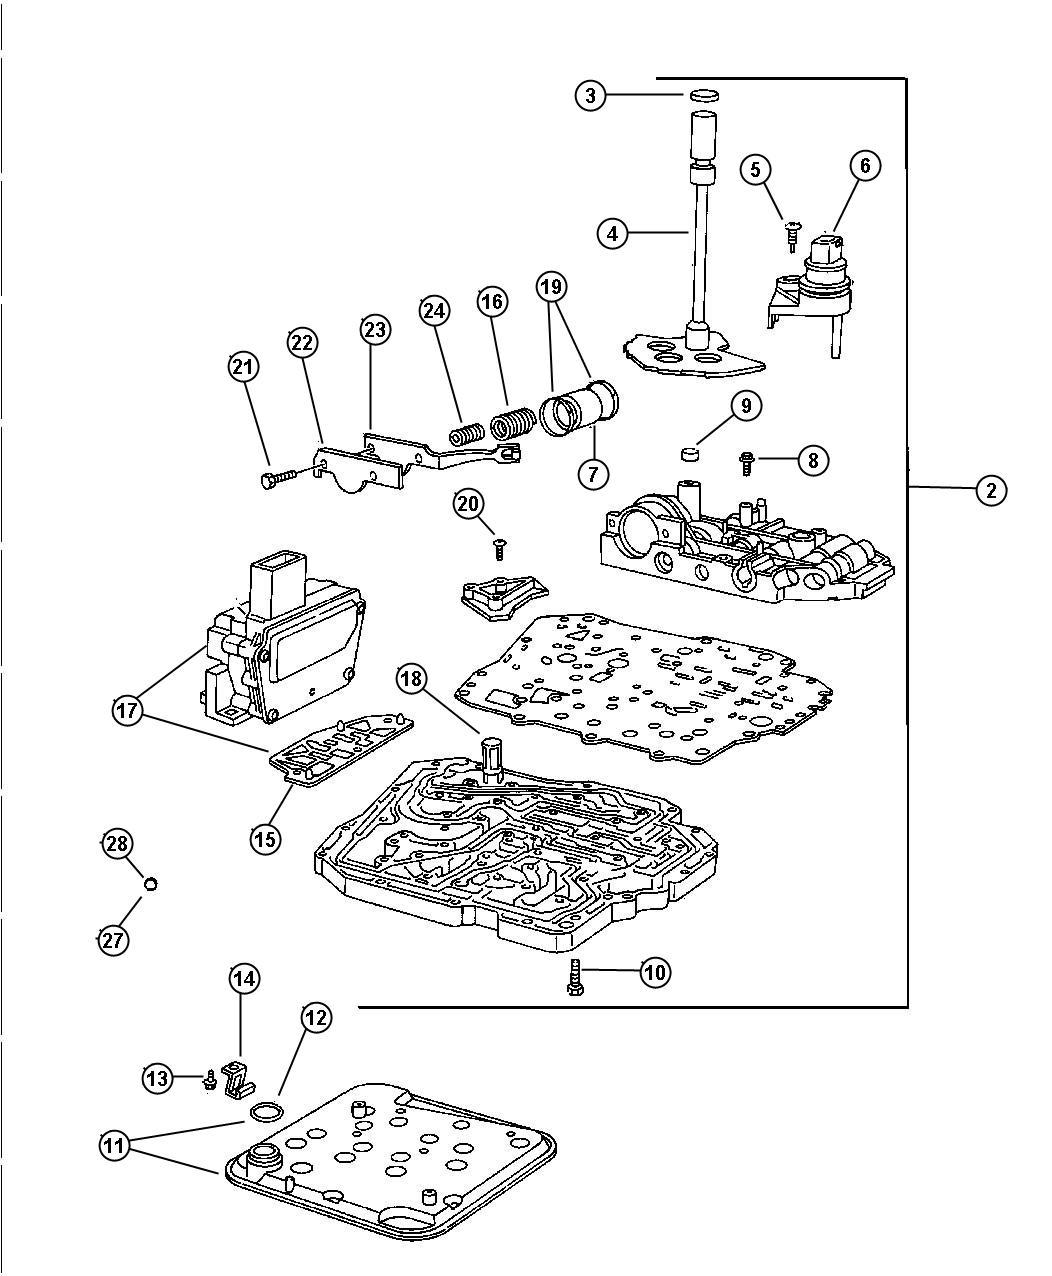 2005 peterbilt engine diagrams html